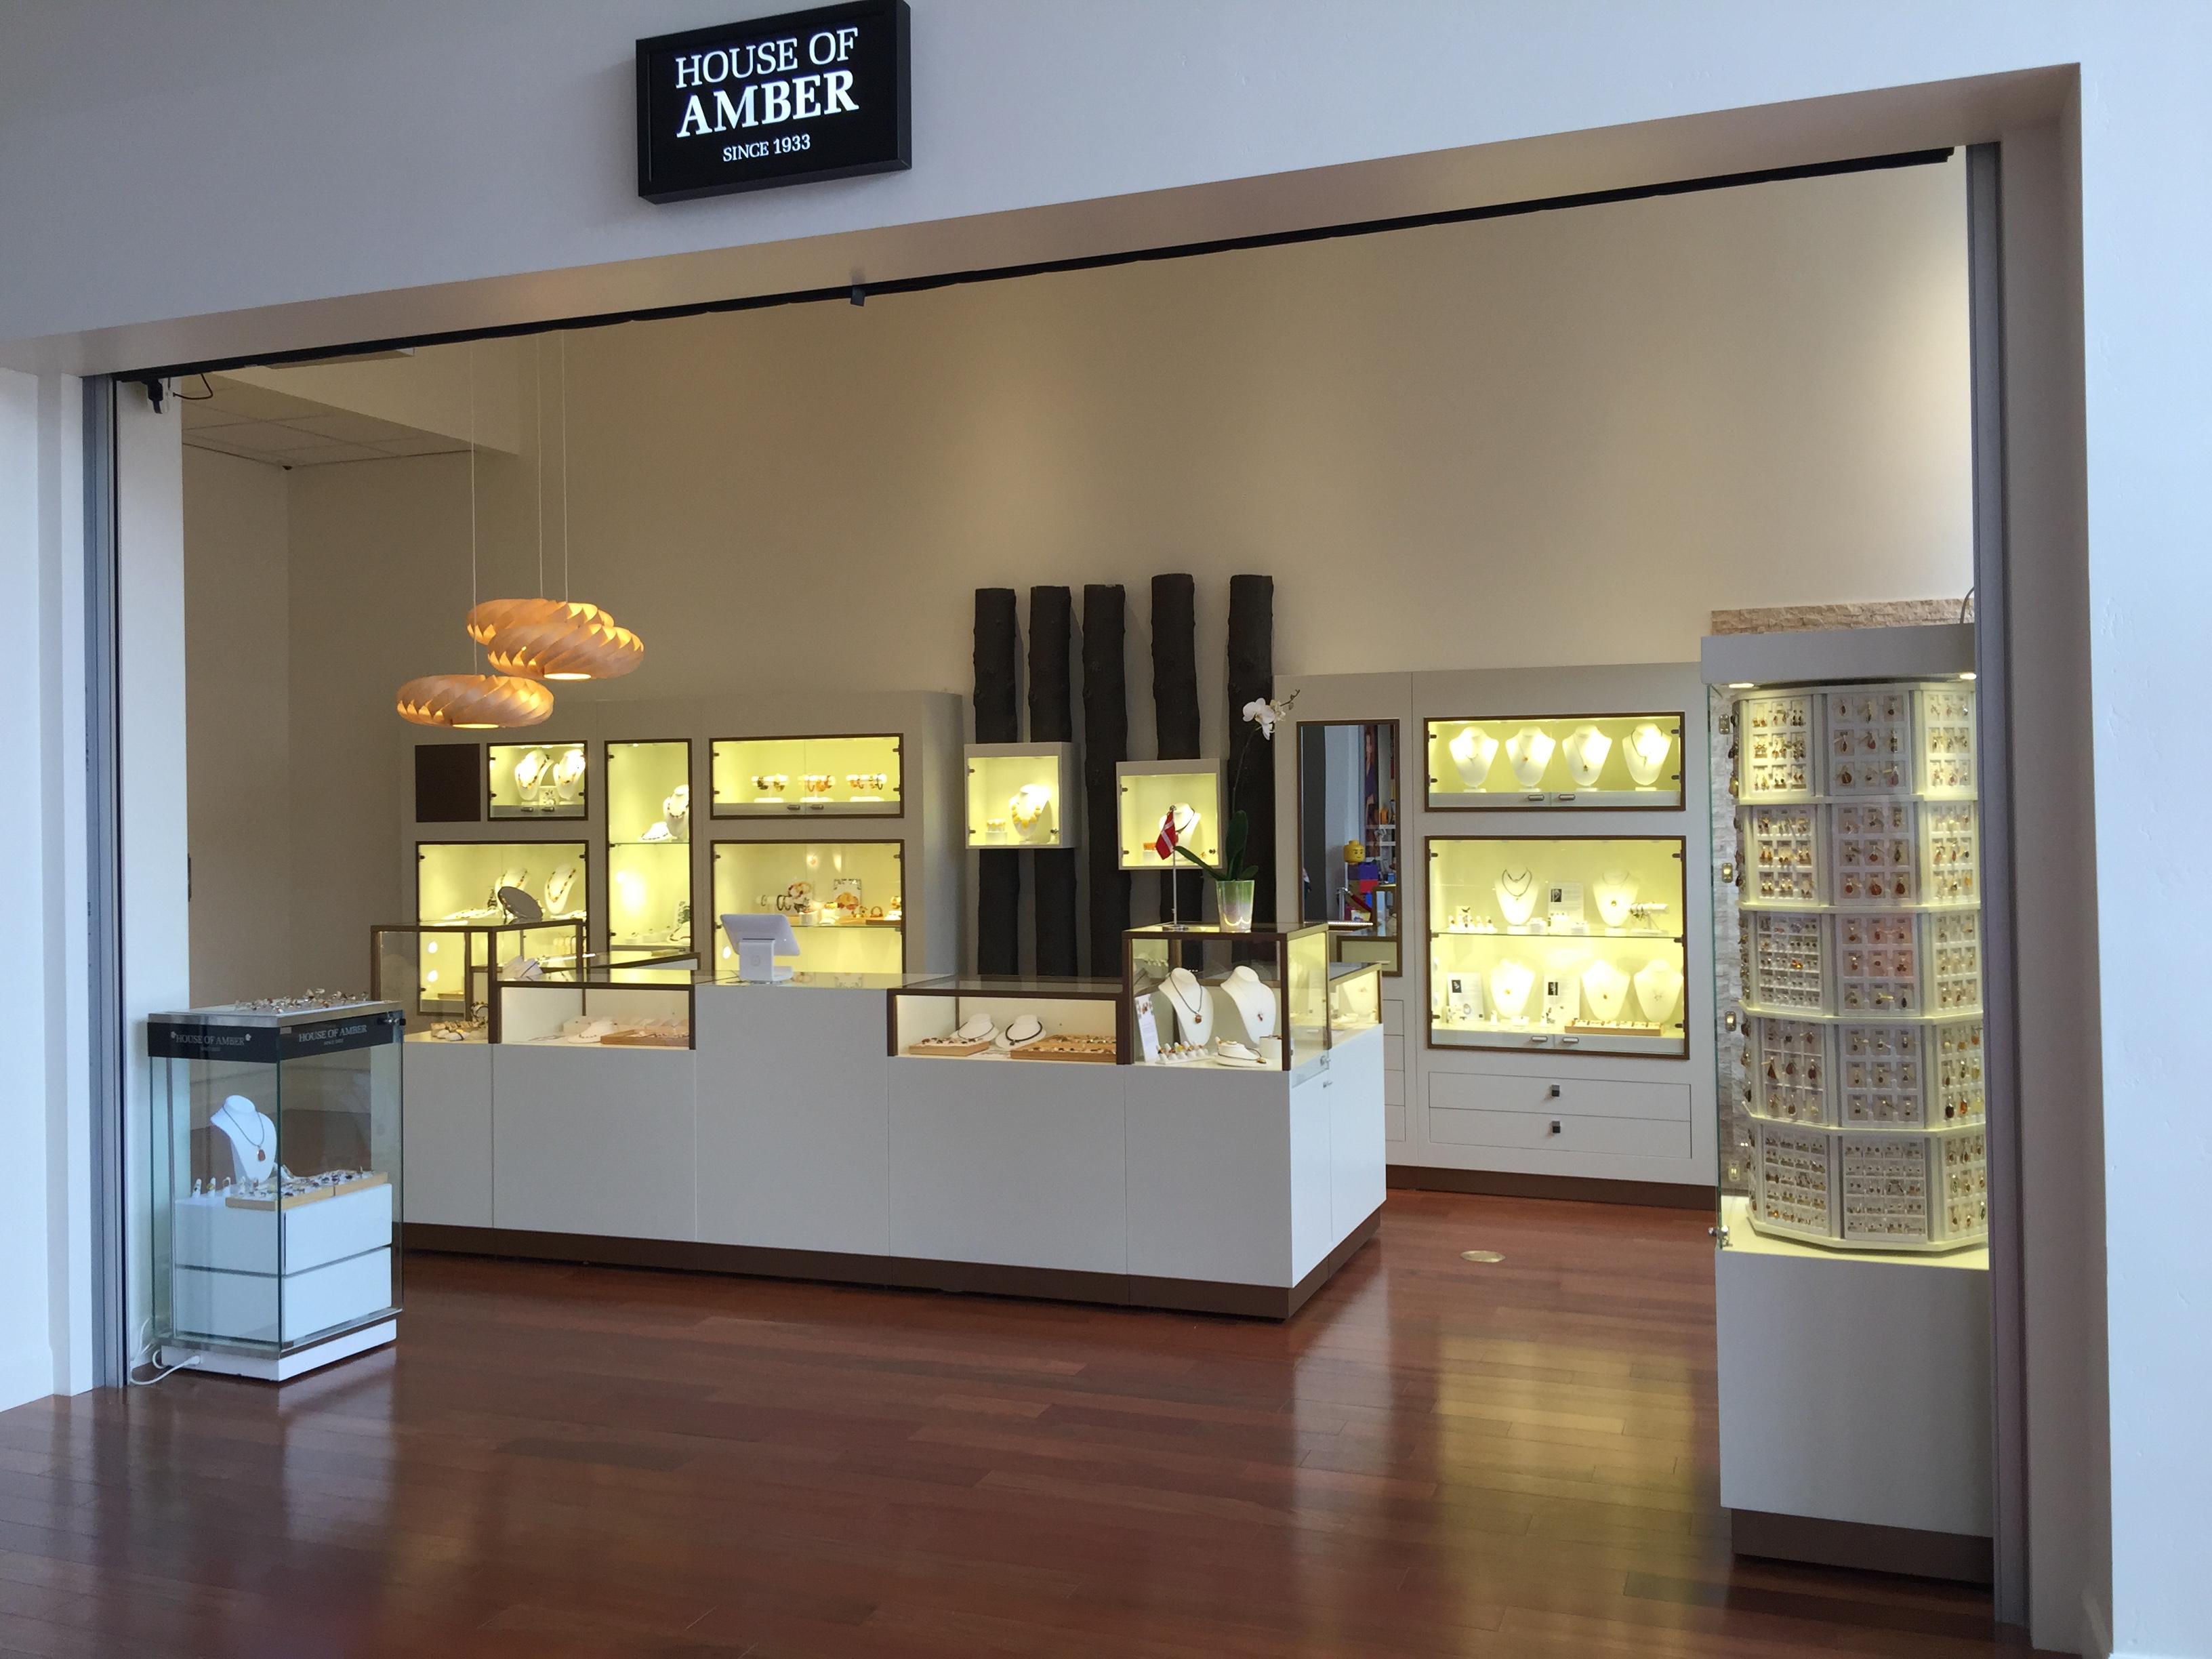 House of Amber åbner i USA